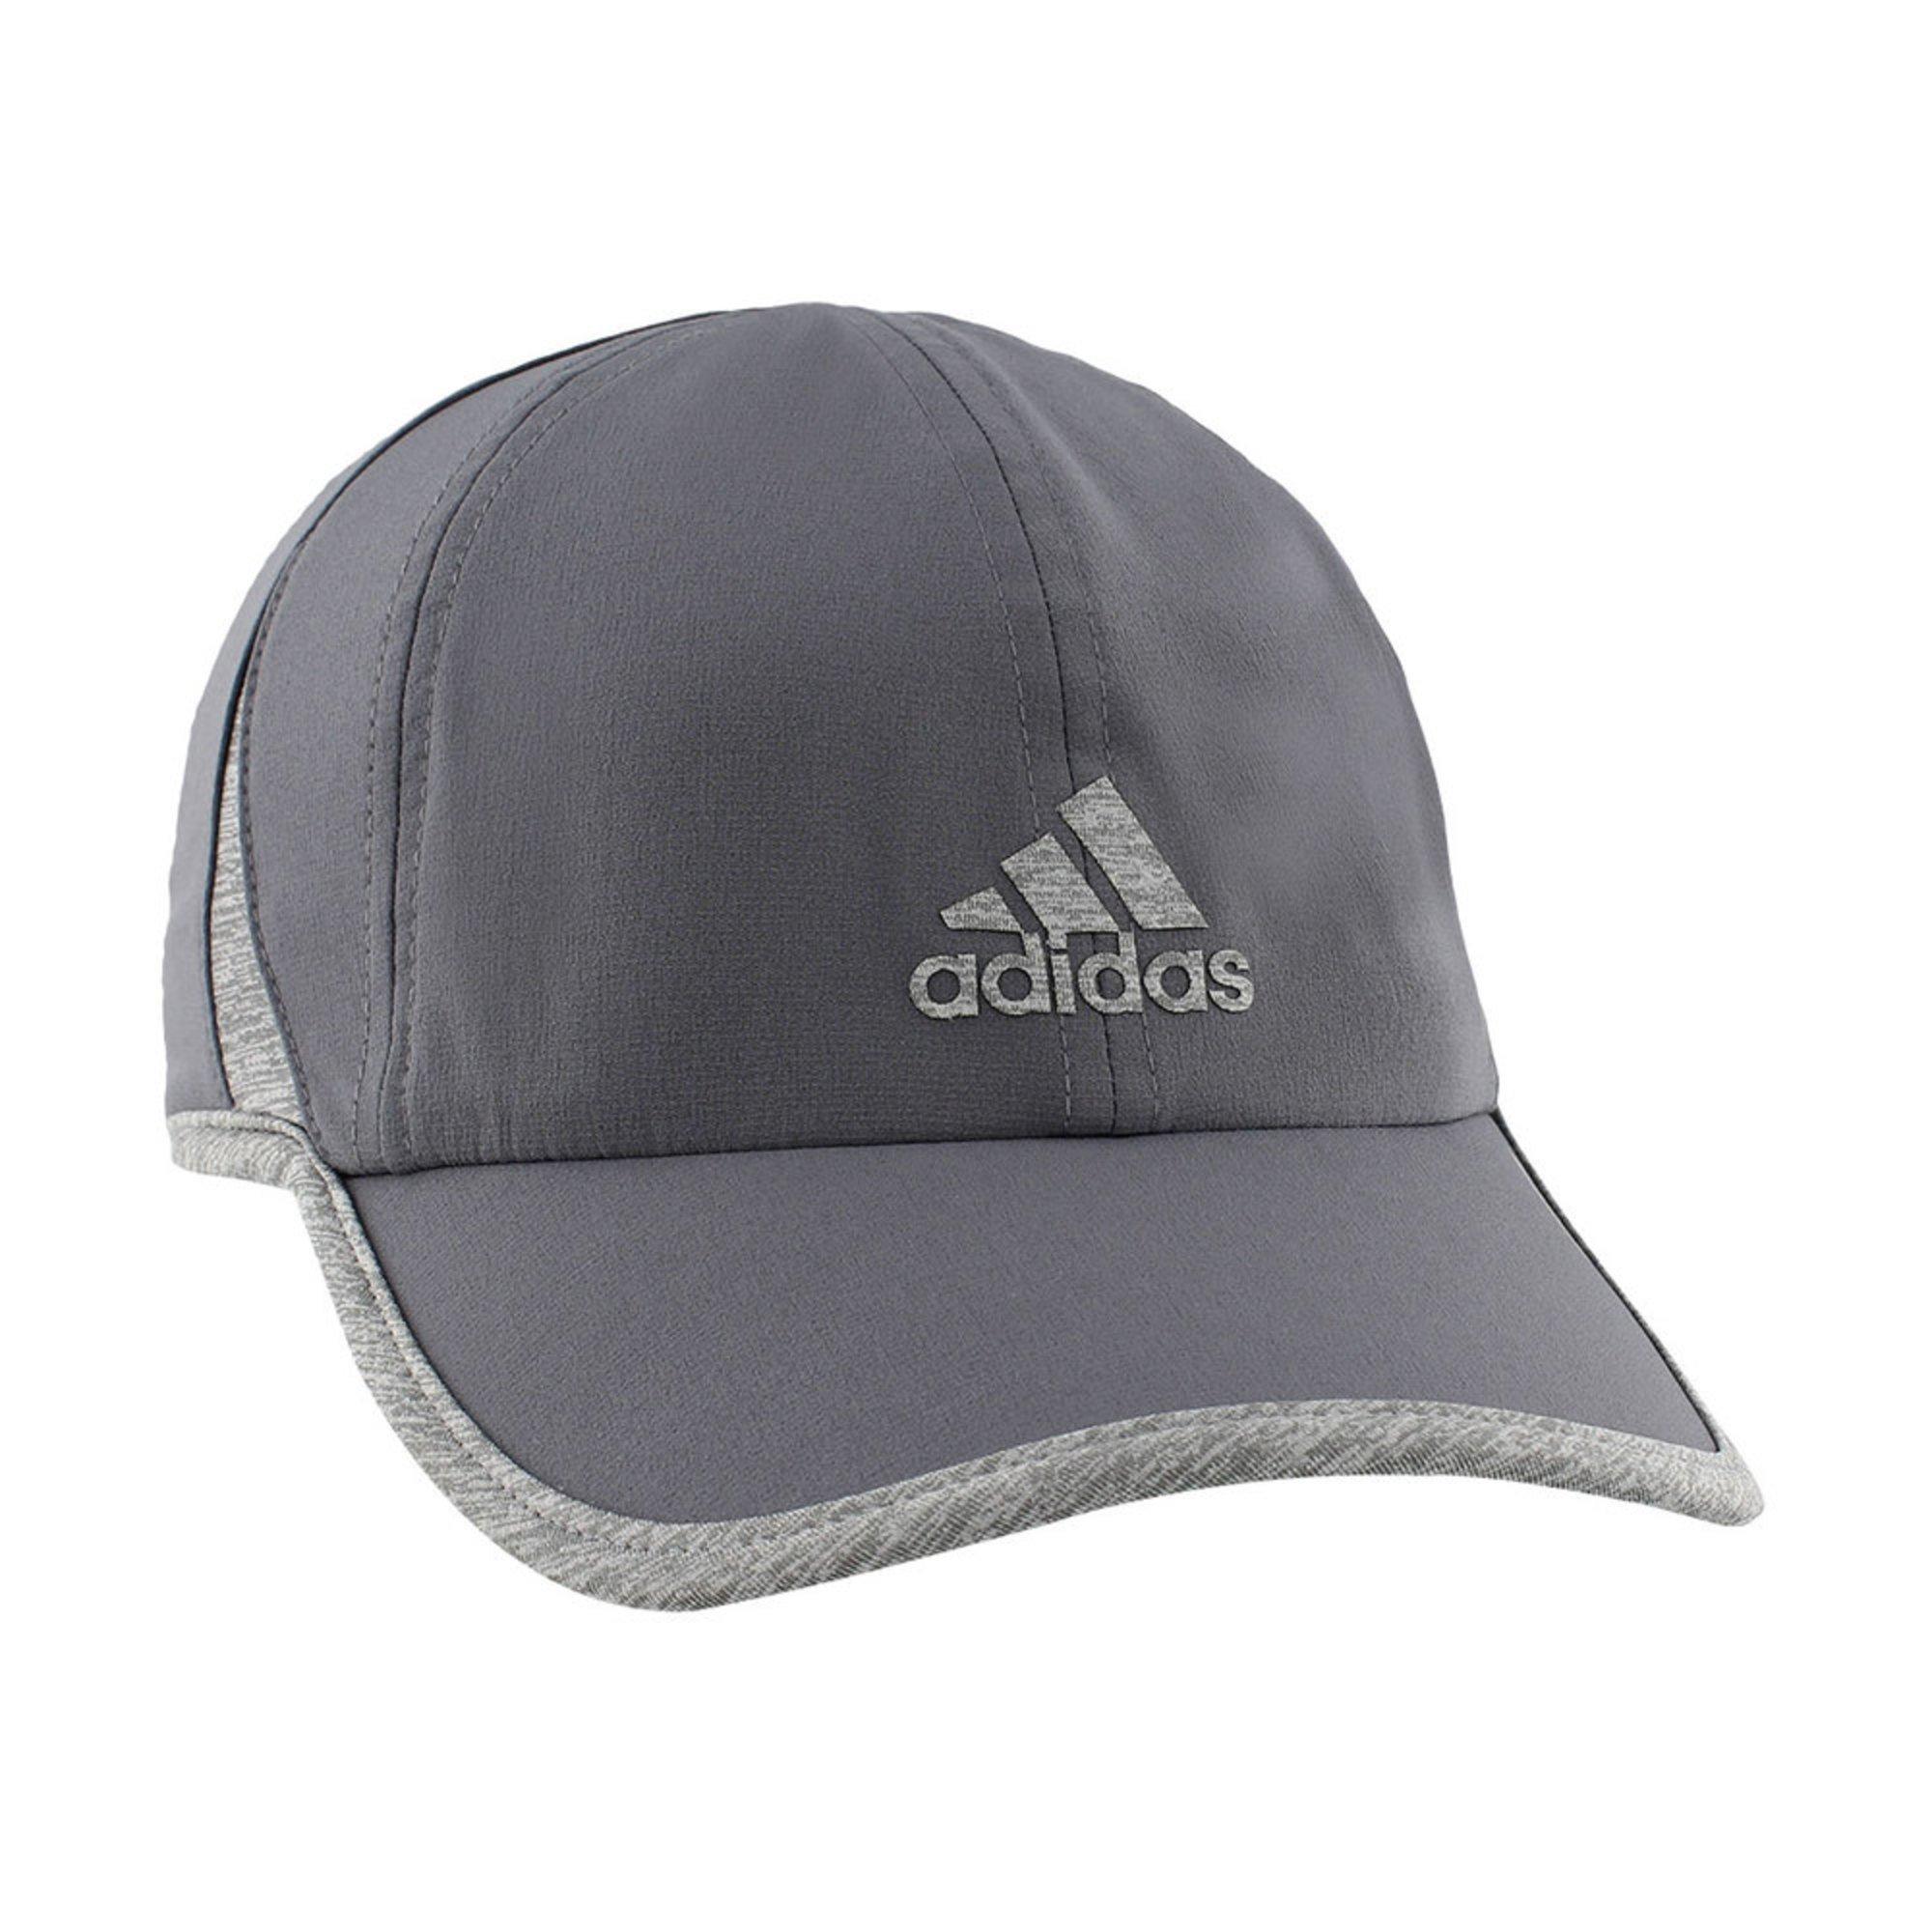 ff8017ab909390 Adidas Men's Superlite Hat | Active Hats & Beanies | Apparel - Shop ...